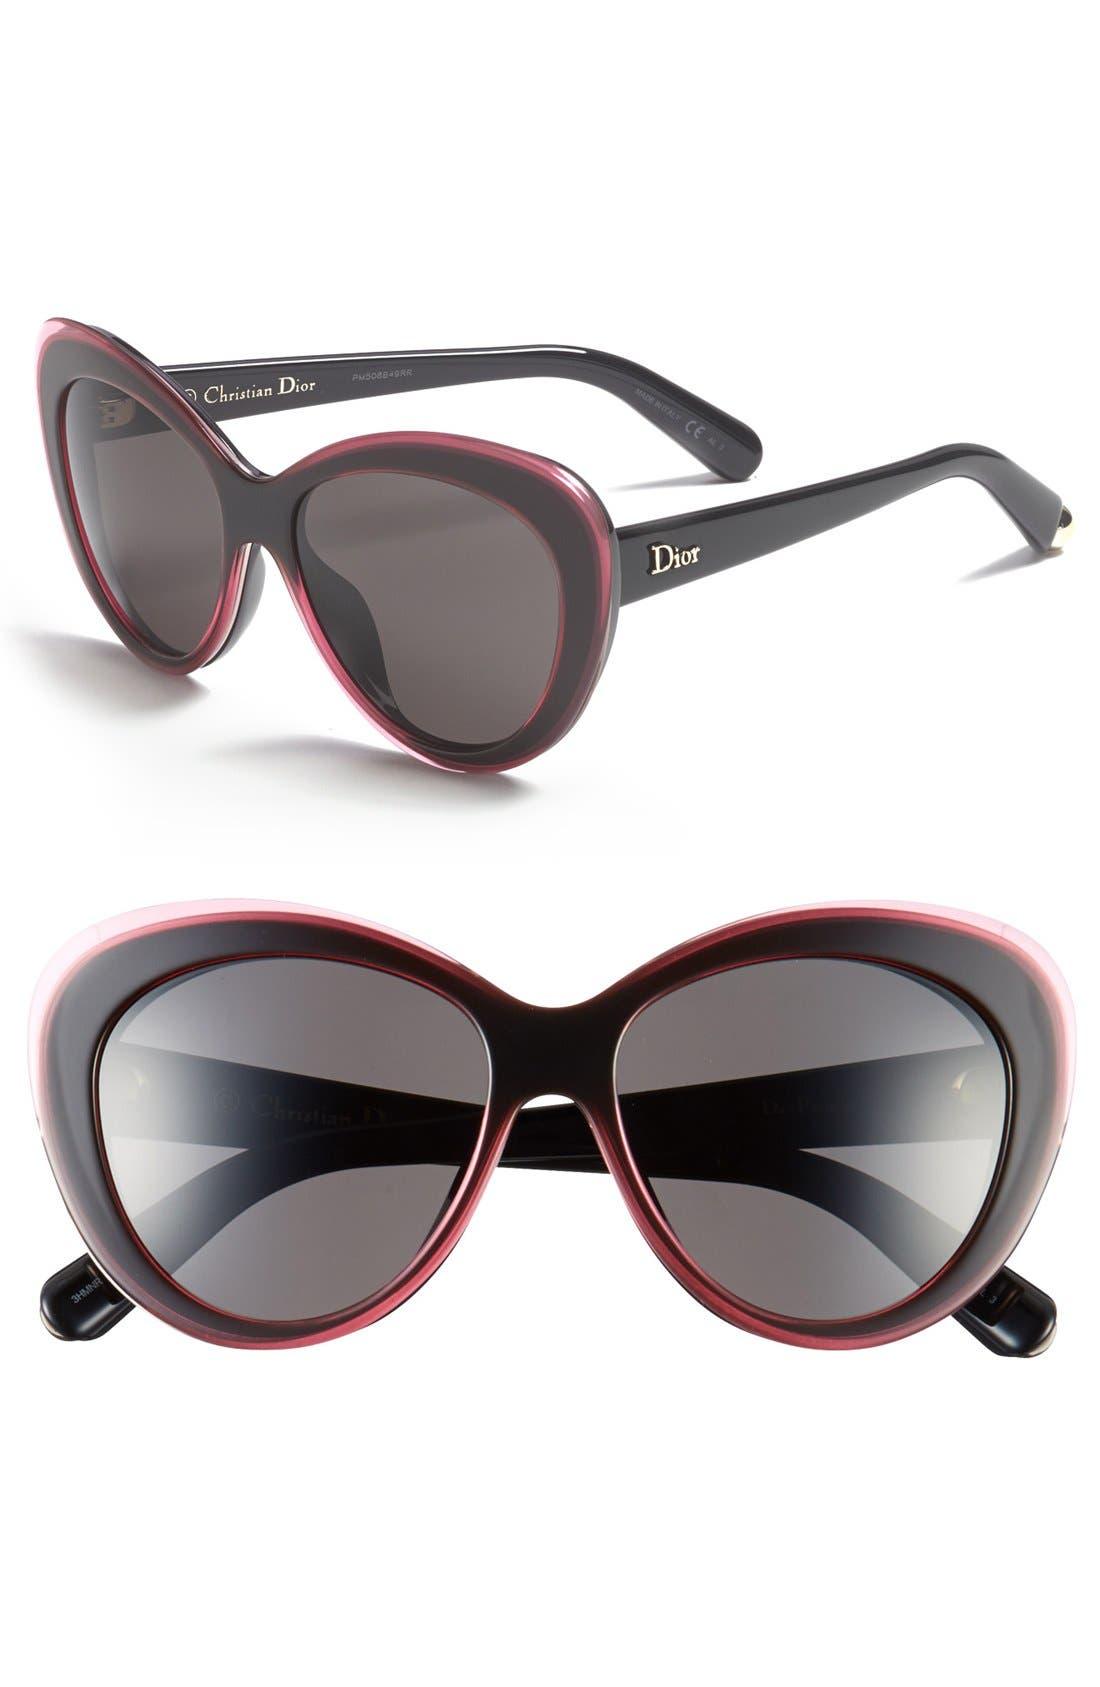 Main Image - Dior 'Promesse 1' 55mmCat Eye Sunglasses